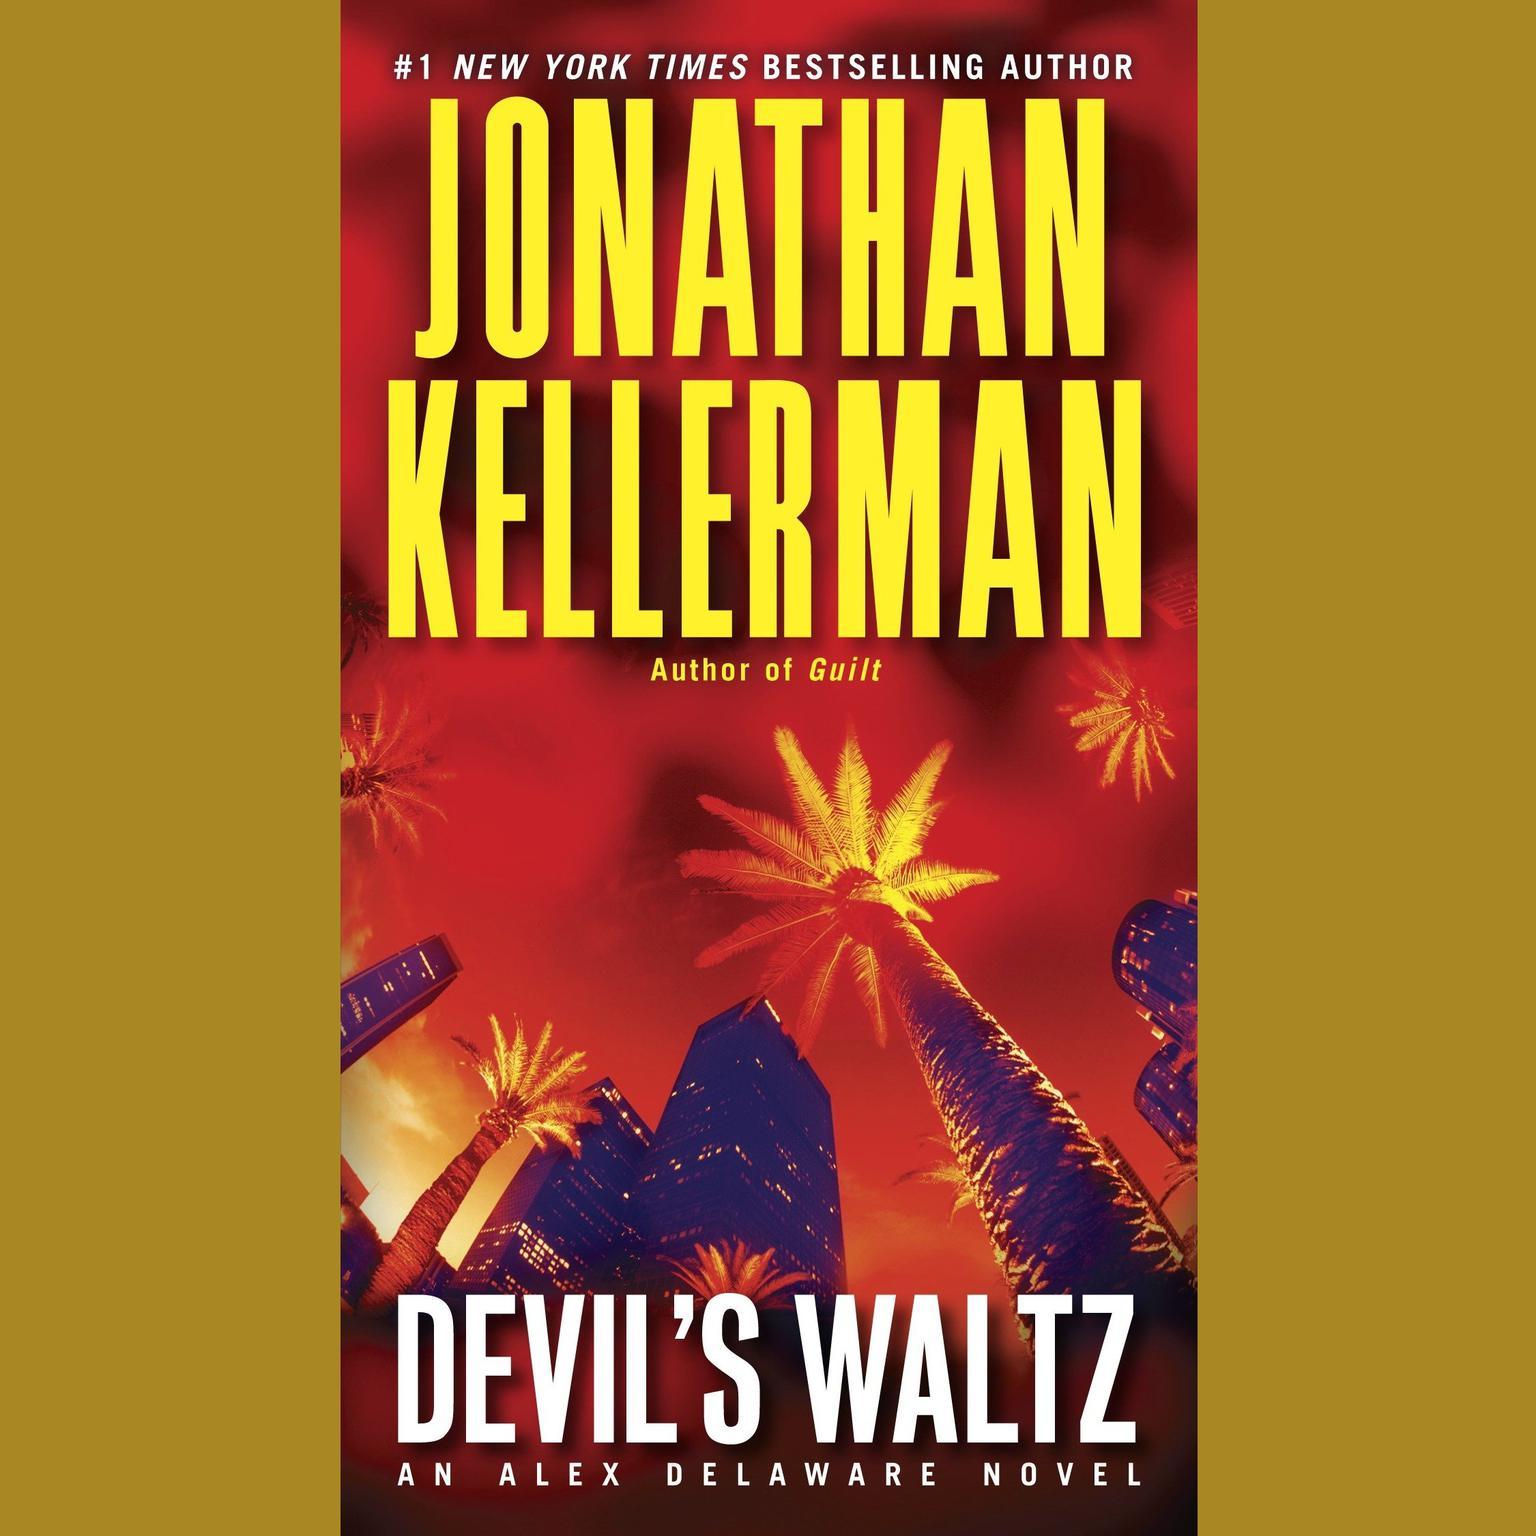 Printable Devil's Waltz: An Alex Delaware Novel Audiobook Cover Art